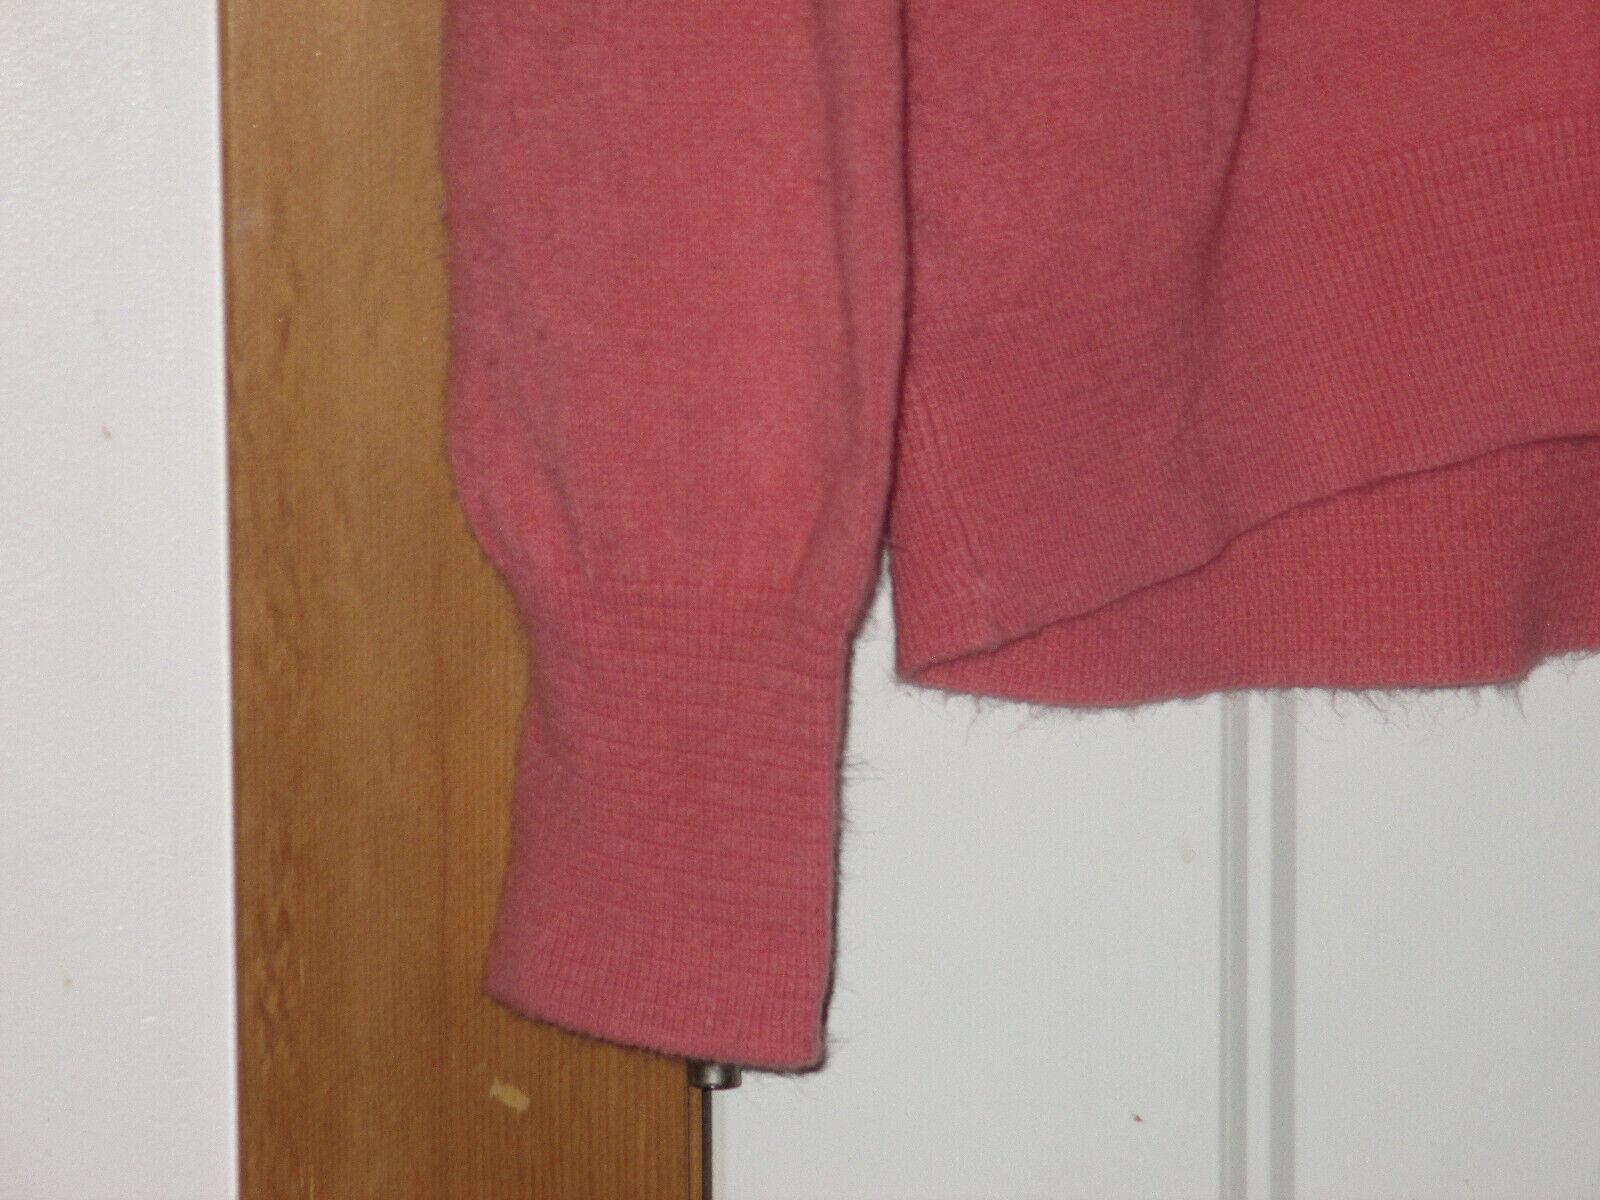 Rare Vintage 1980s Christian Dior Logo Sweater  - image 6